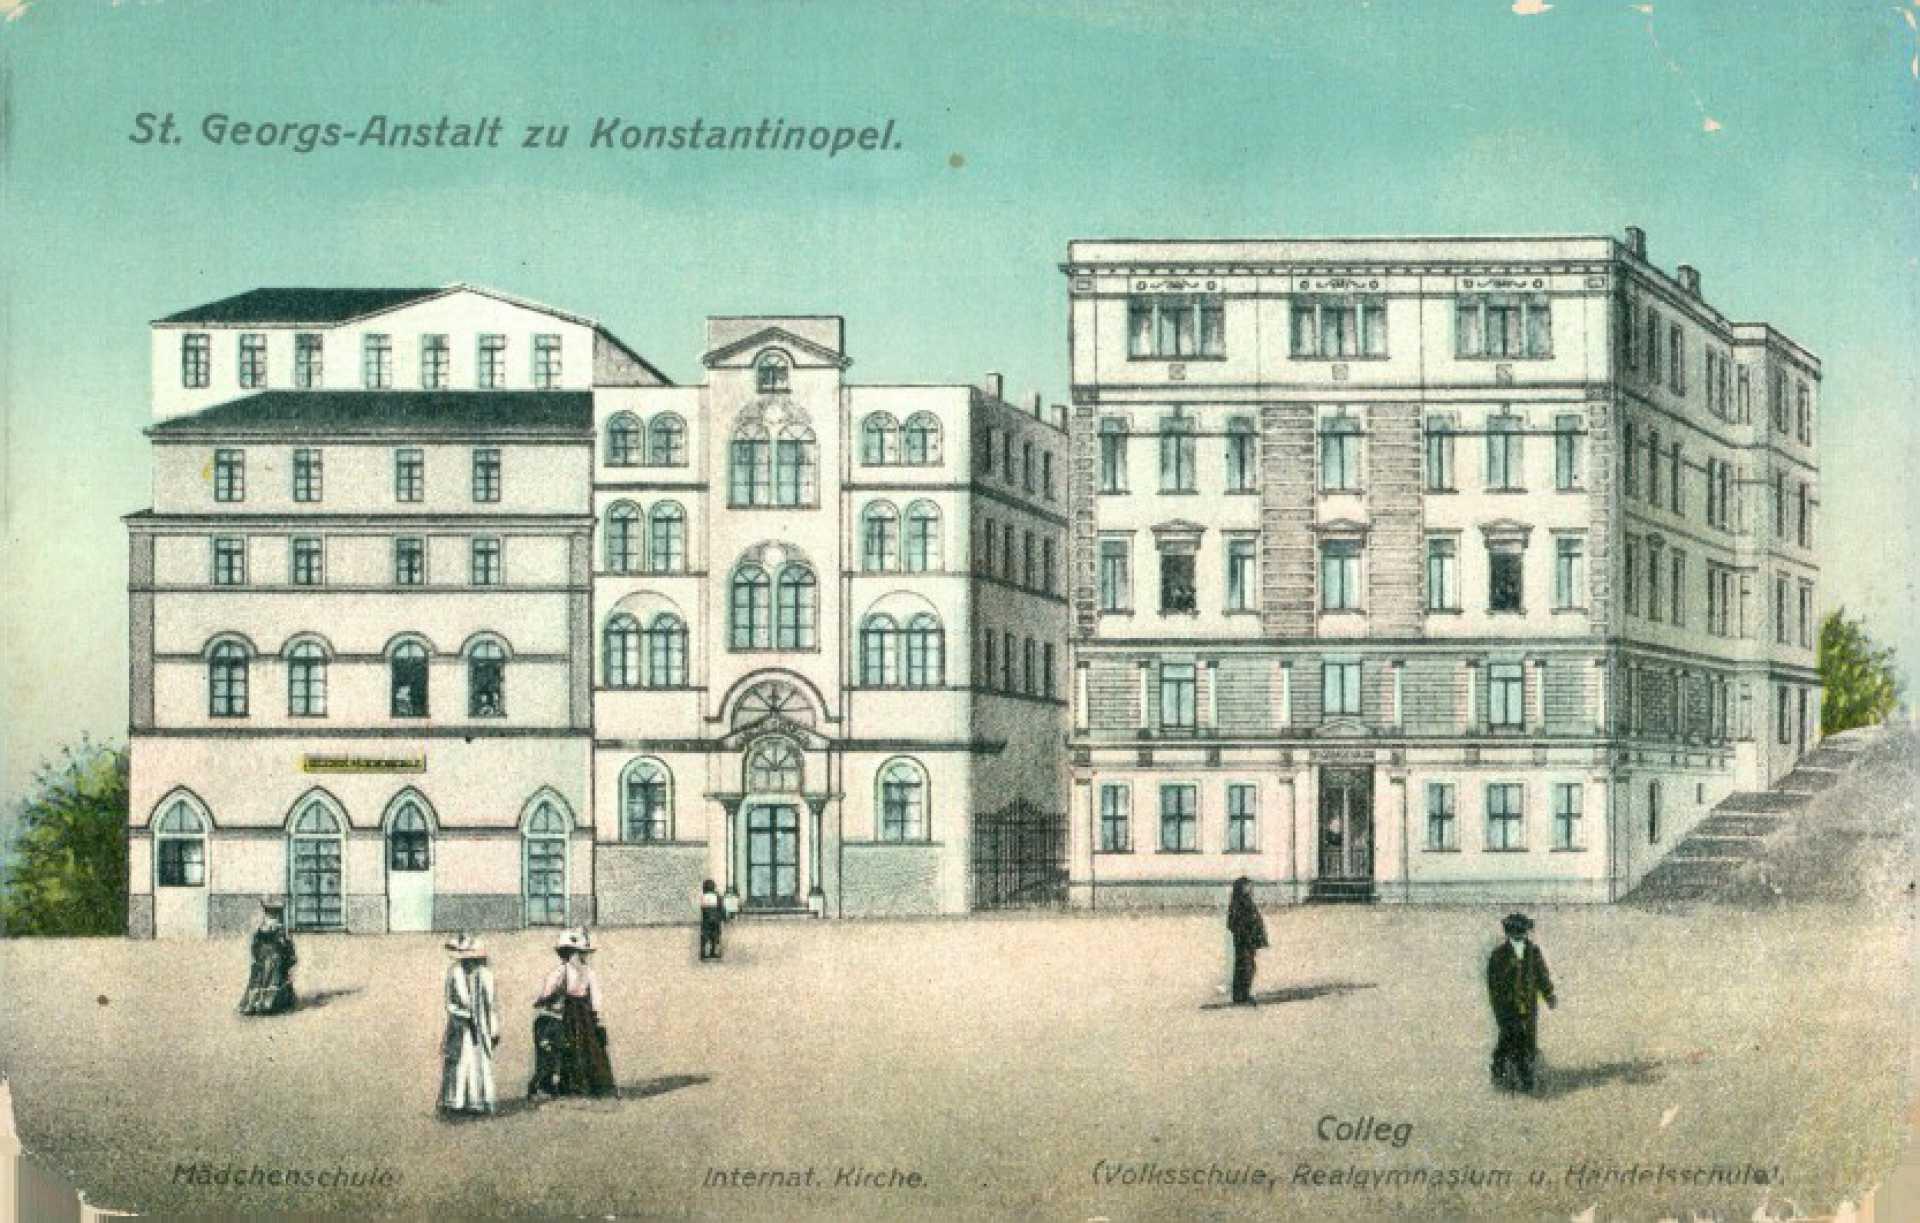 St. Goergs-Anstalt zu Konstantinopel